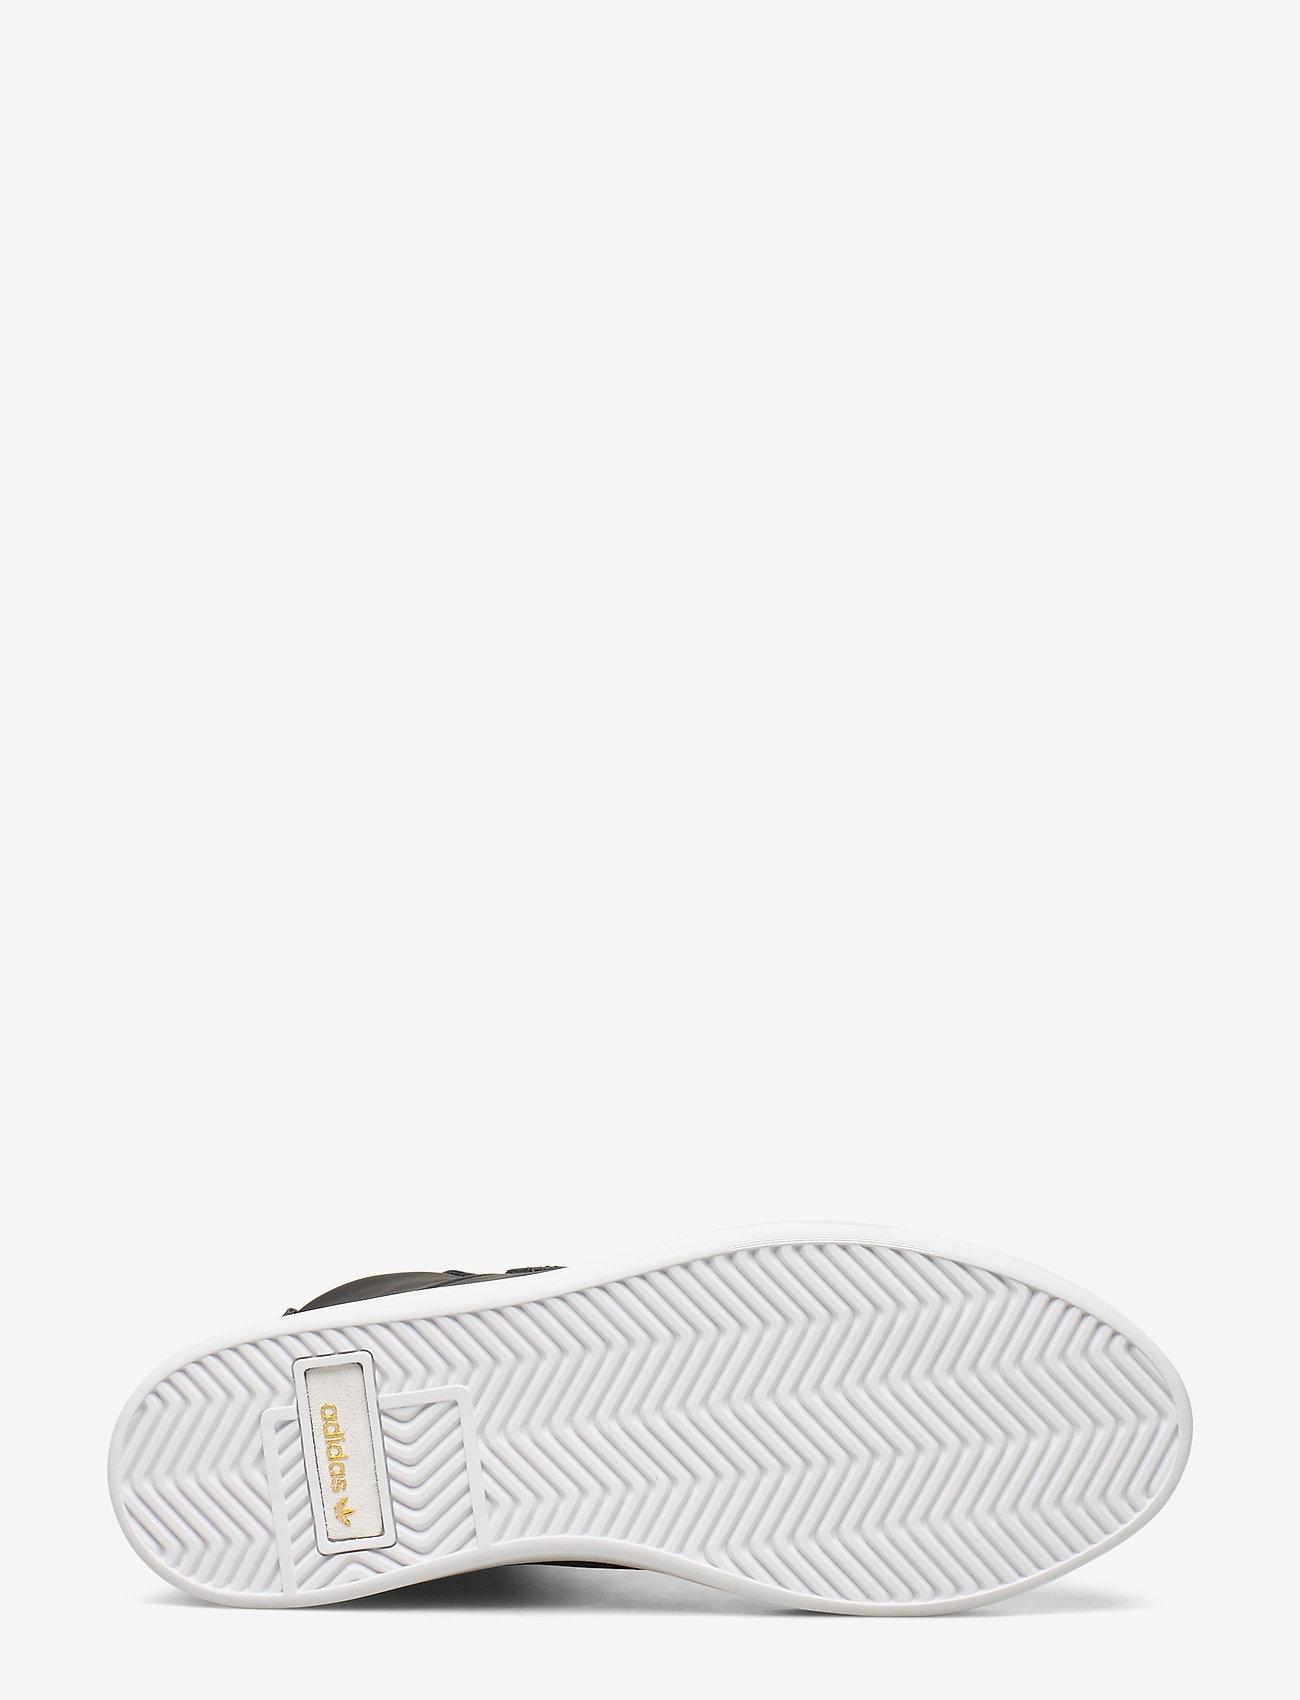 Adidas Sleek Mid W (Cblack/cblack/crywht) (799 kr) - adidas Originals